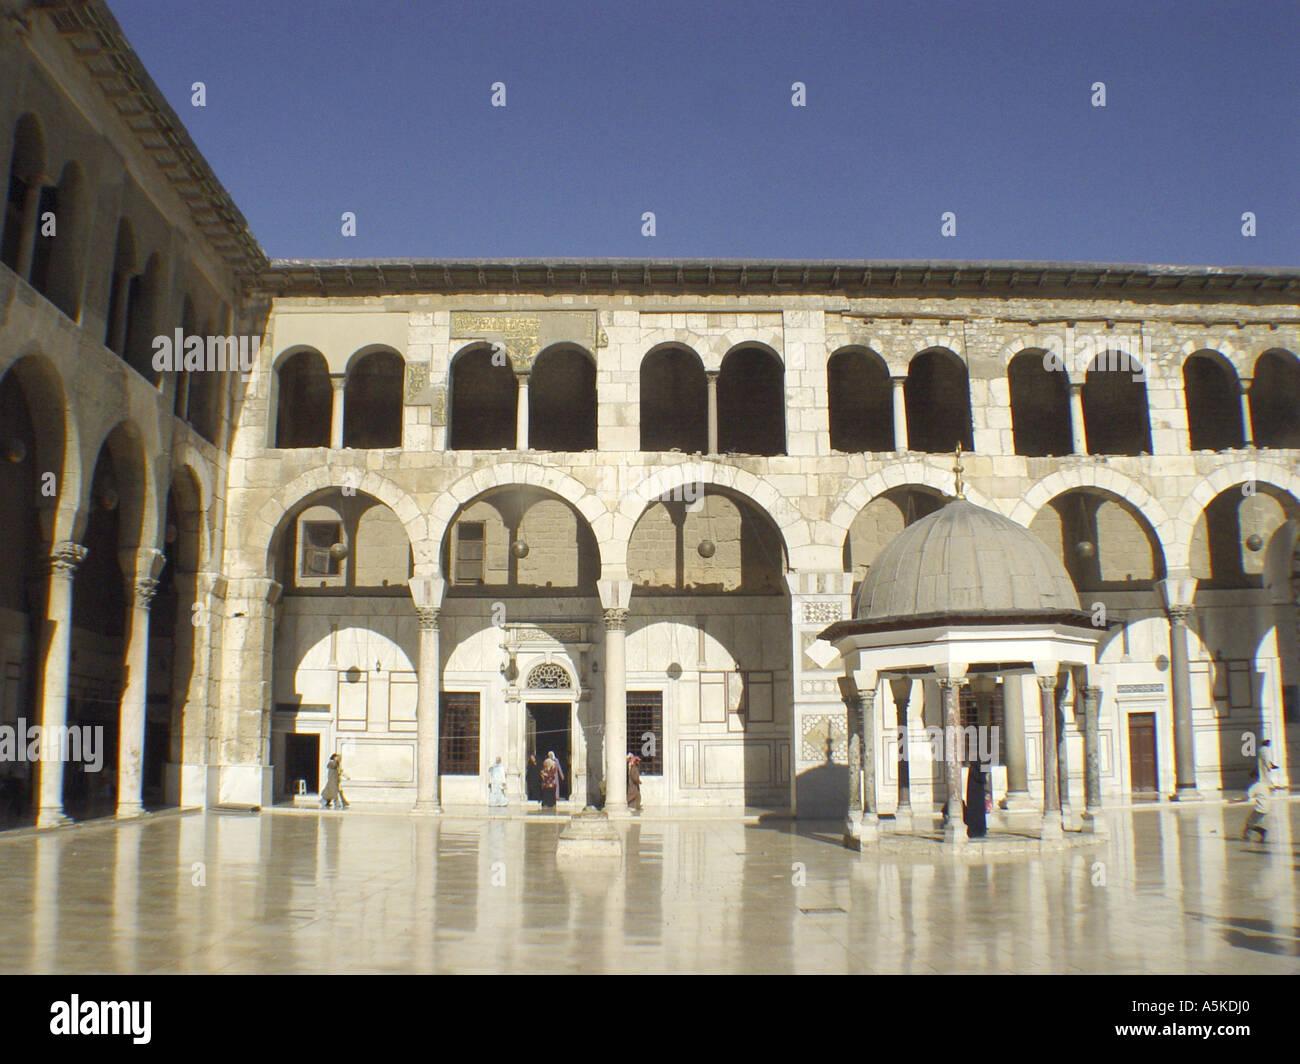 Omayyaden mosque in damascus - Stock Image